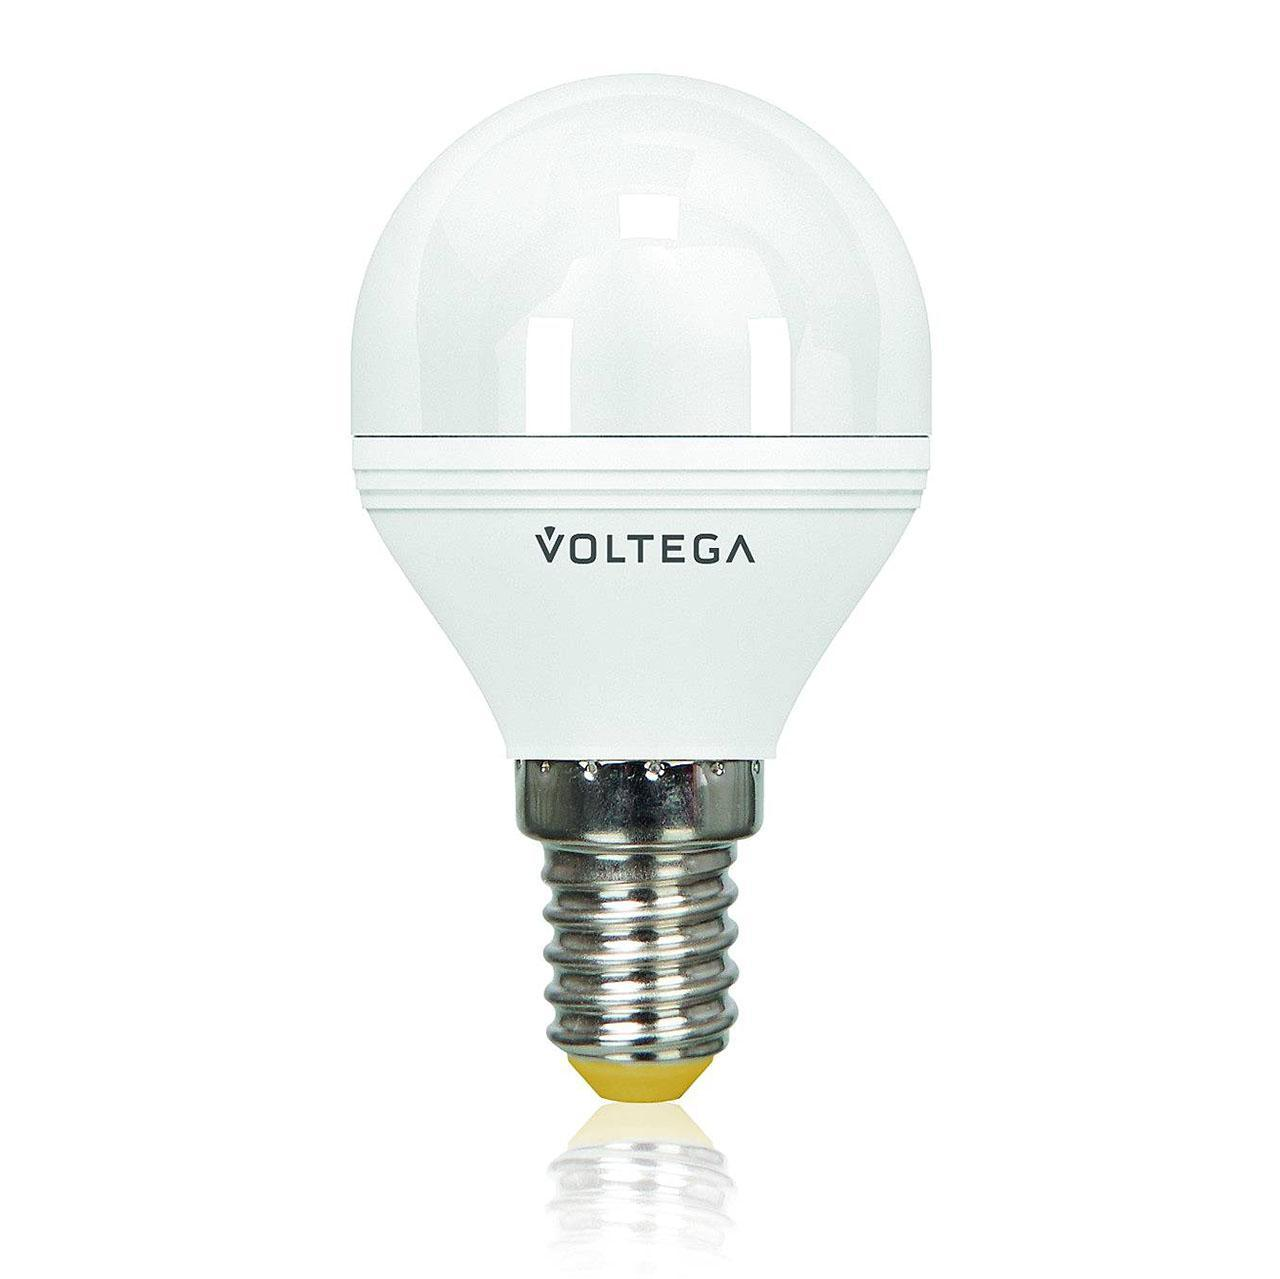 Лампа светодиодная диммируемая E14 6W 2800К матовая VG2-G2E14warm6W-D 5493 voltega лампа светодиодная voltega таблетка матовая gx53 7 2w 2800к vg2 t2gx53warm7w 5739